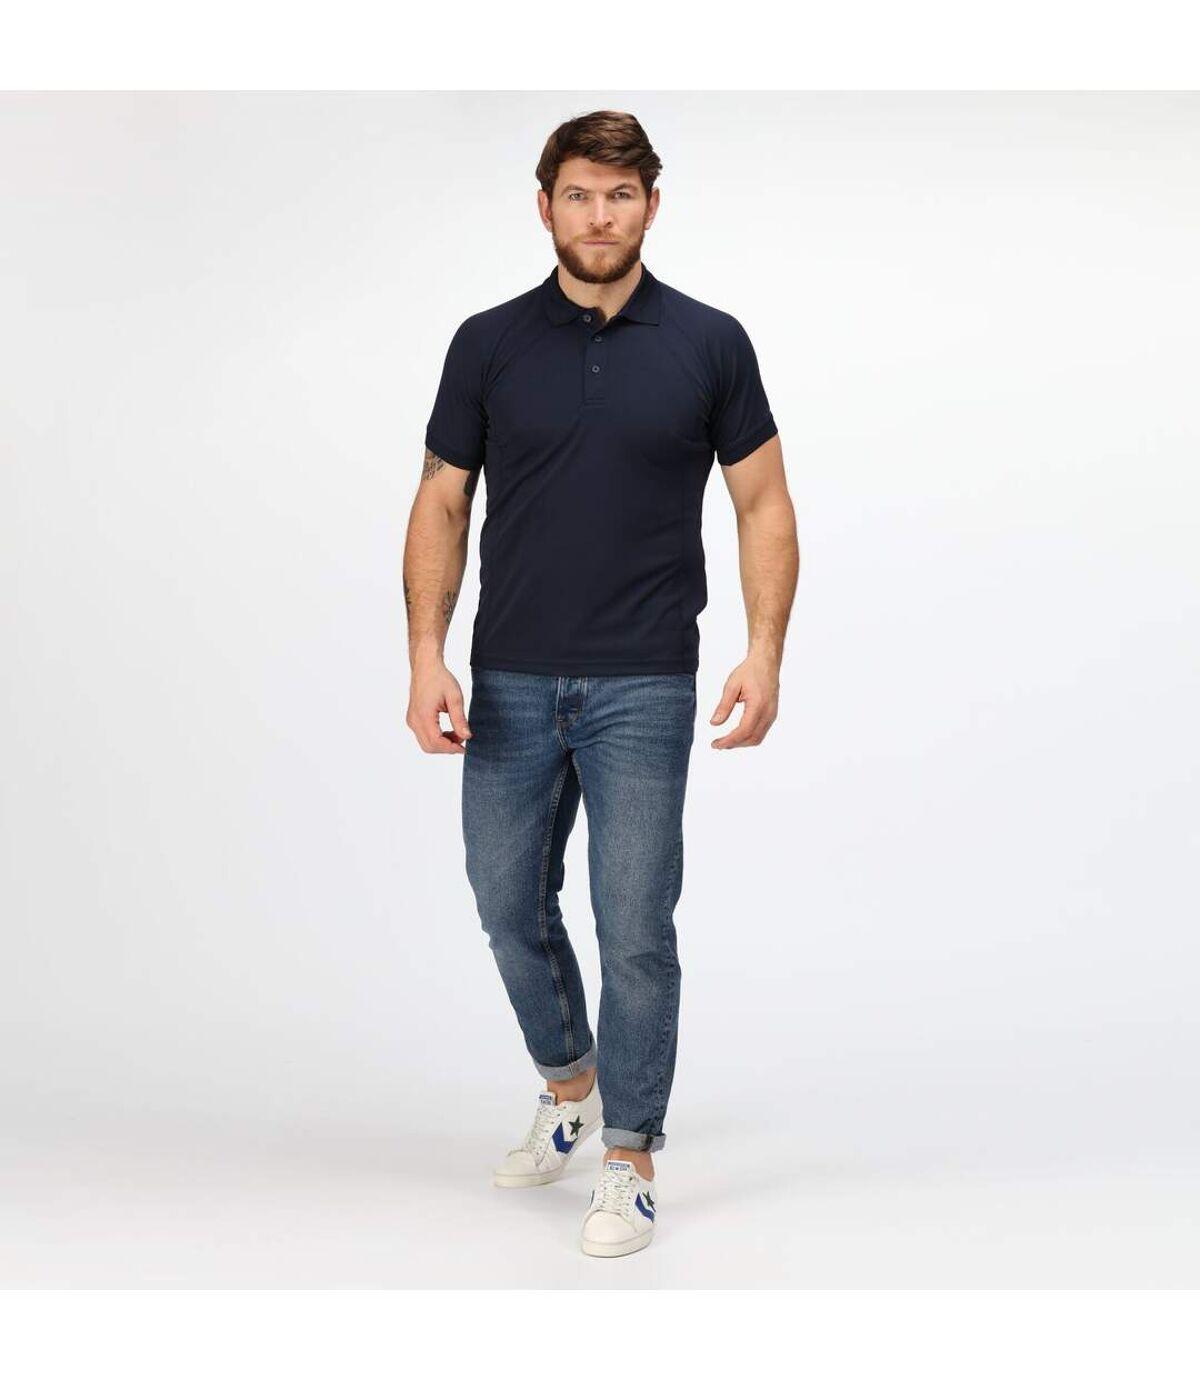 Regatta Hardwear Mens Coolweave Short Sleeve Polo Shirt (Navy) - UTRW4606